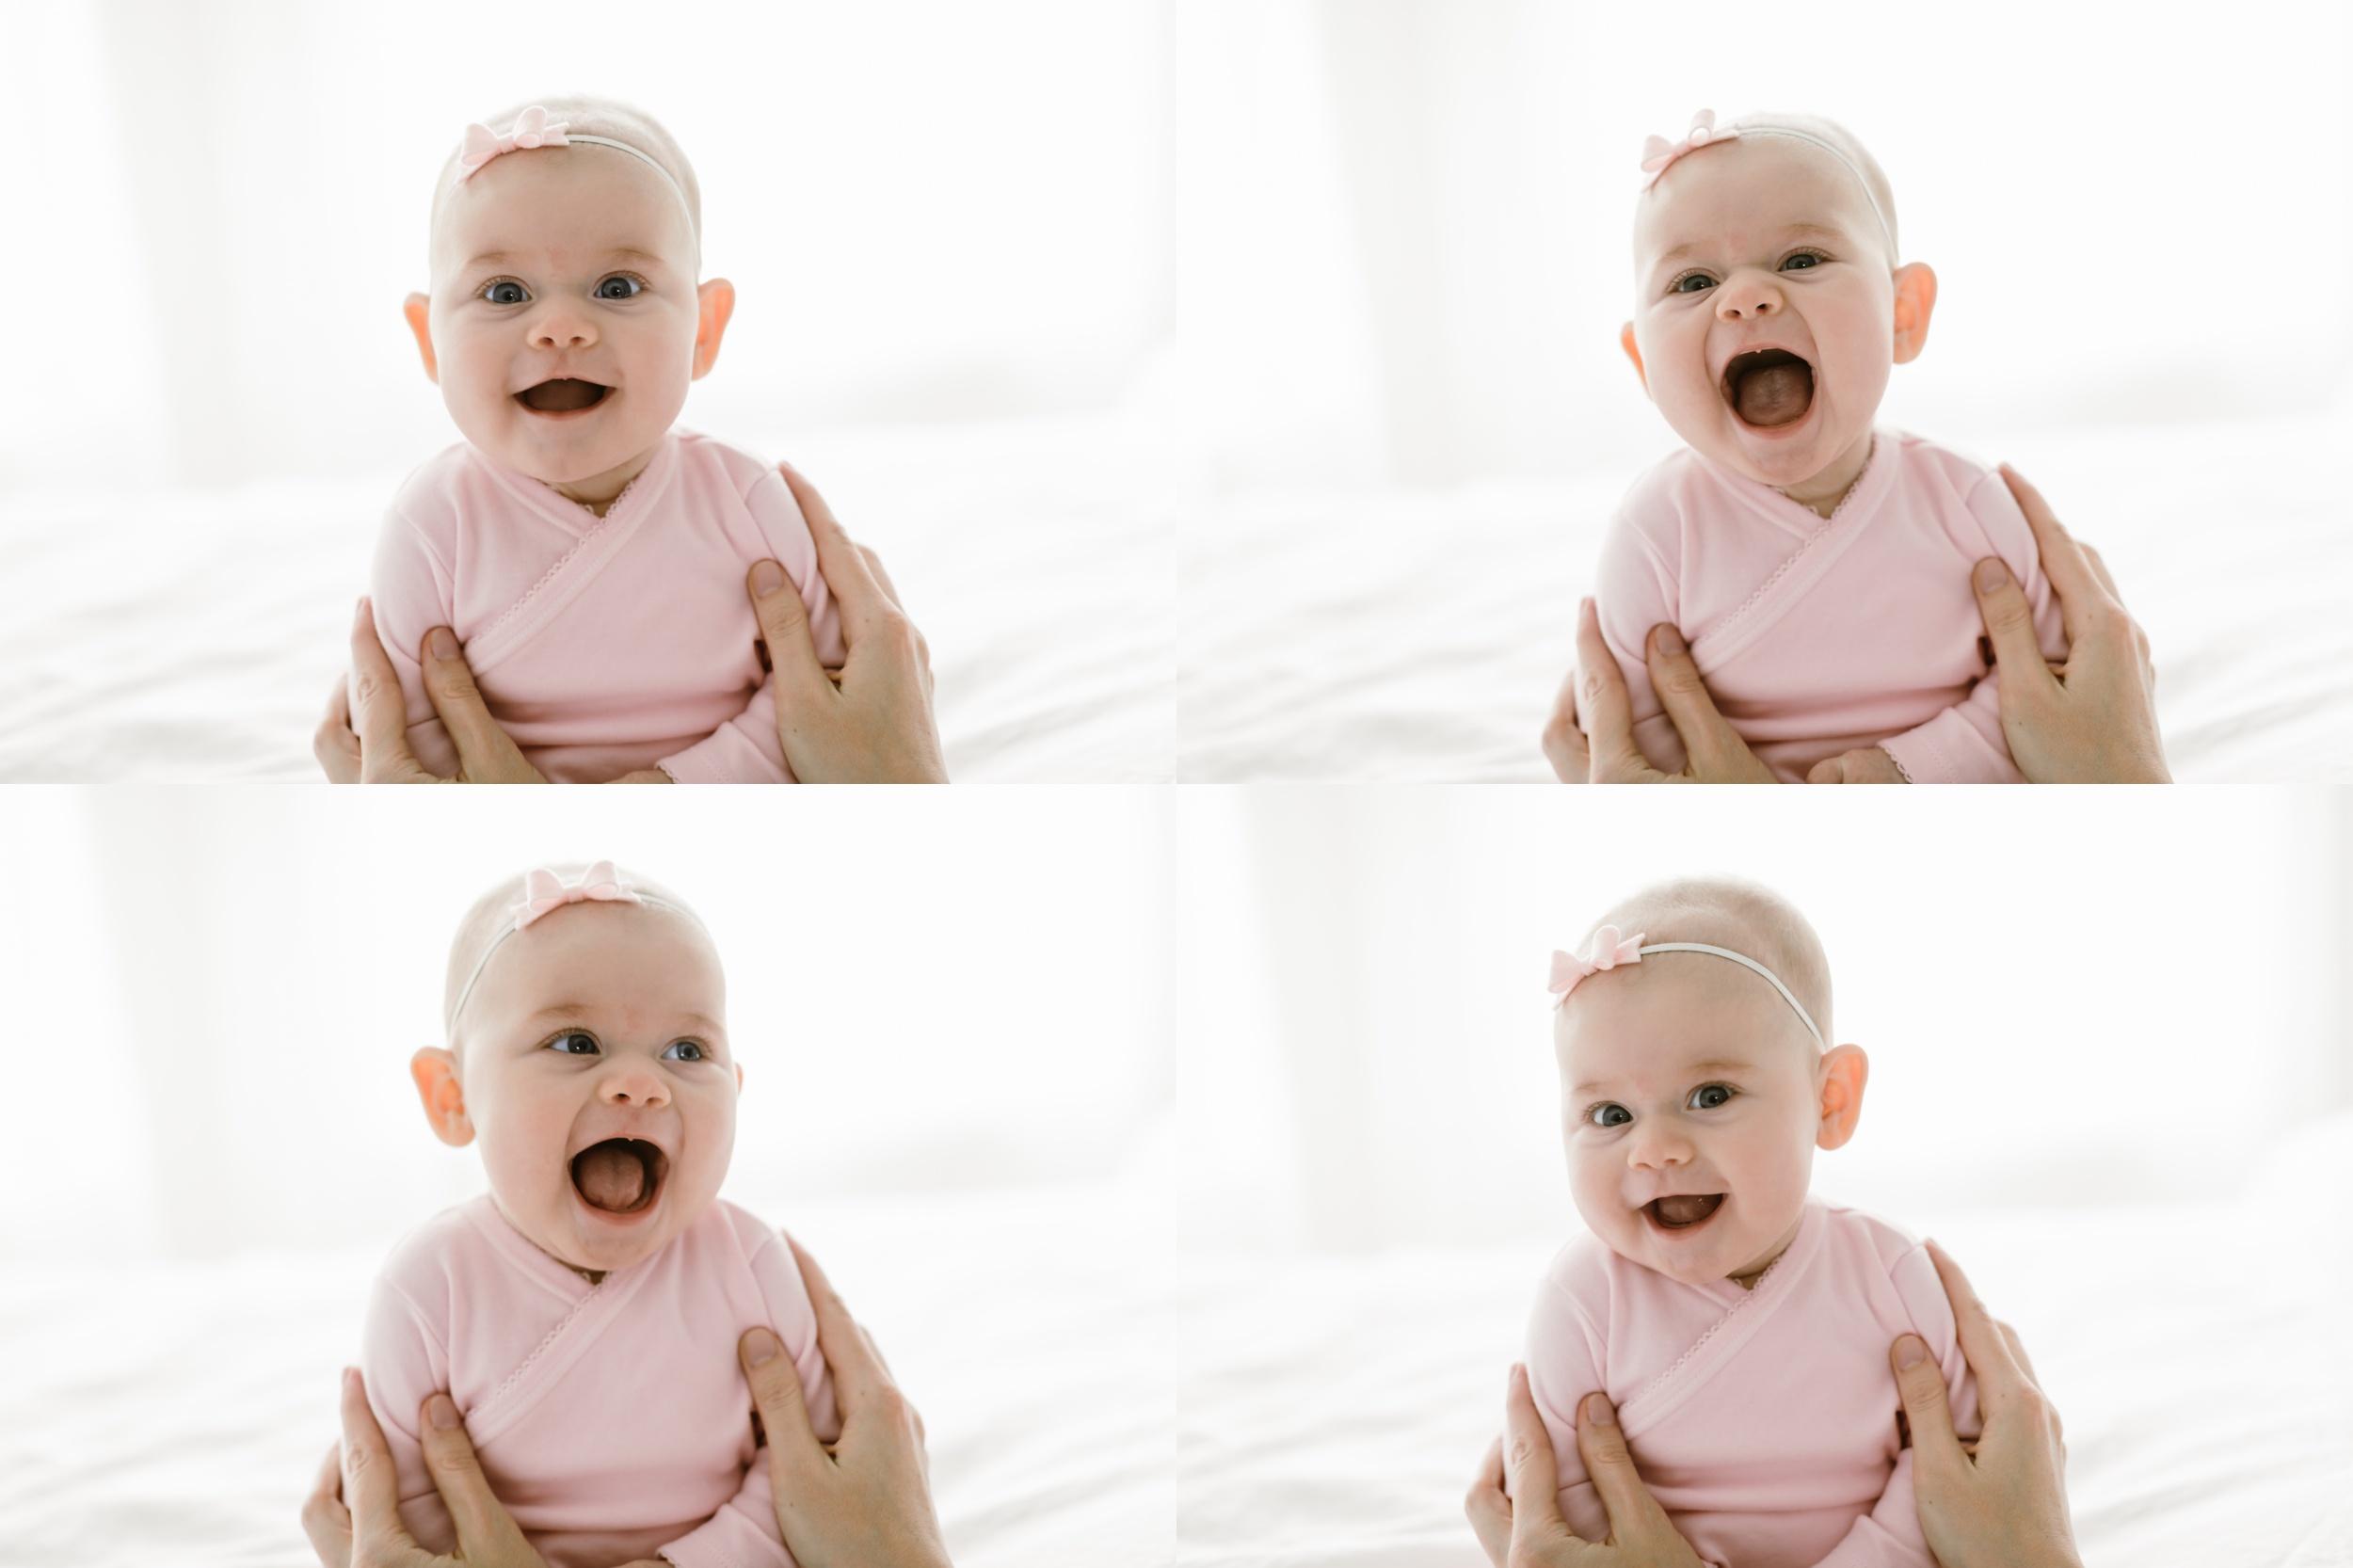 chicago baby lifestyle photographer jenny grimm photography milestone studio session